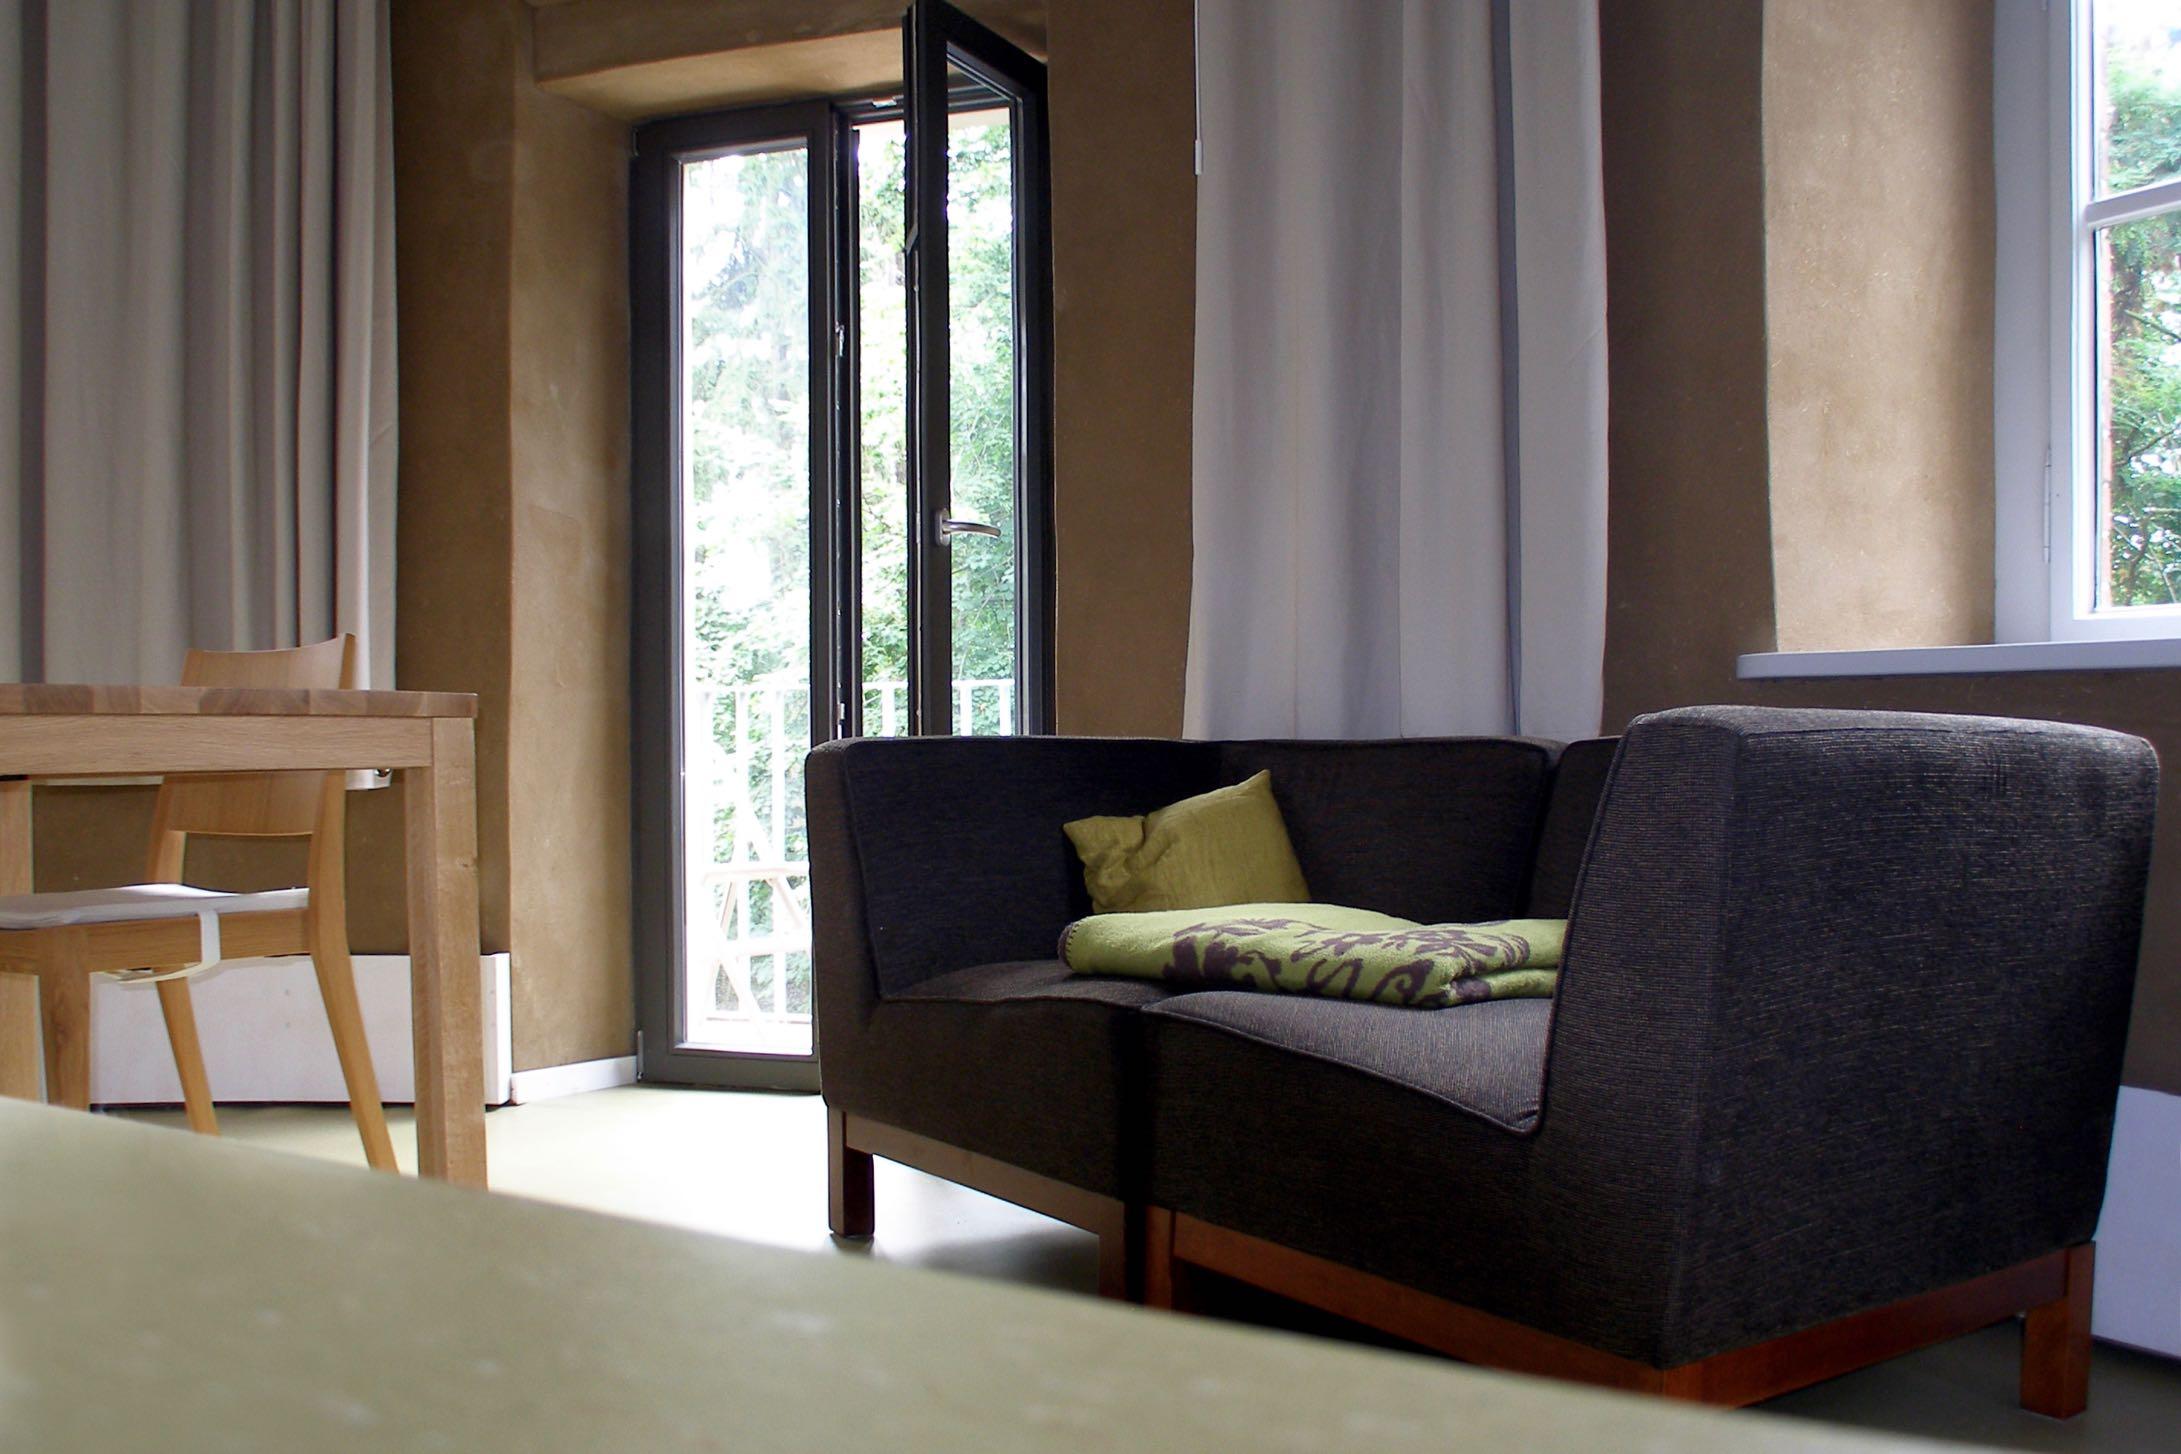 wasserturm waren urlaub im denkmal. Black Bedroom Furniture Sets. Home Design Ideas